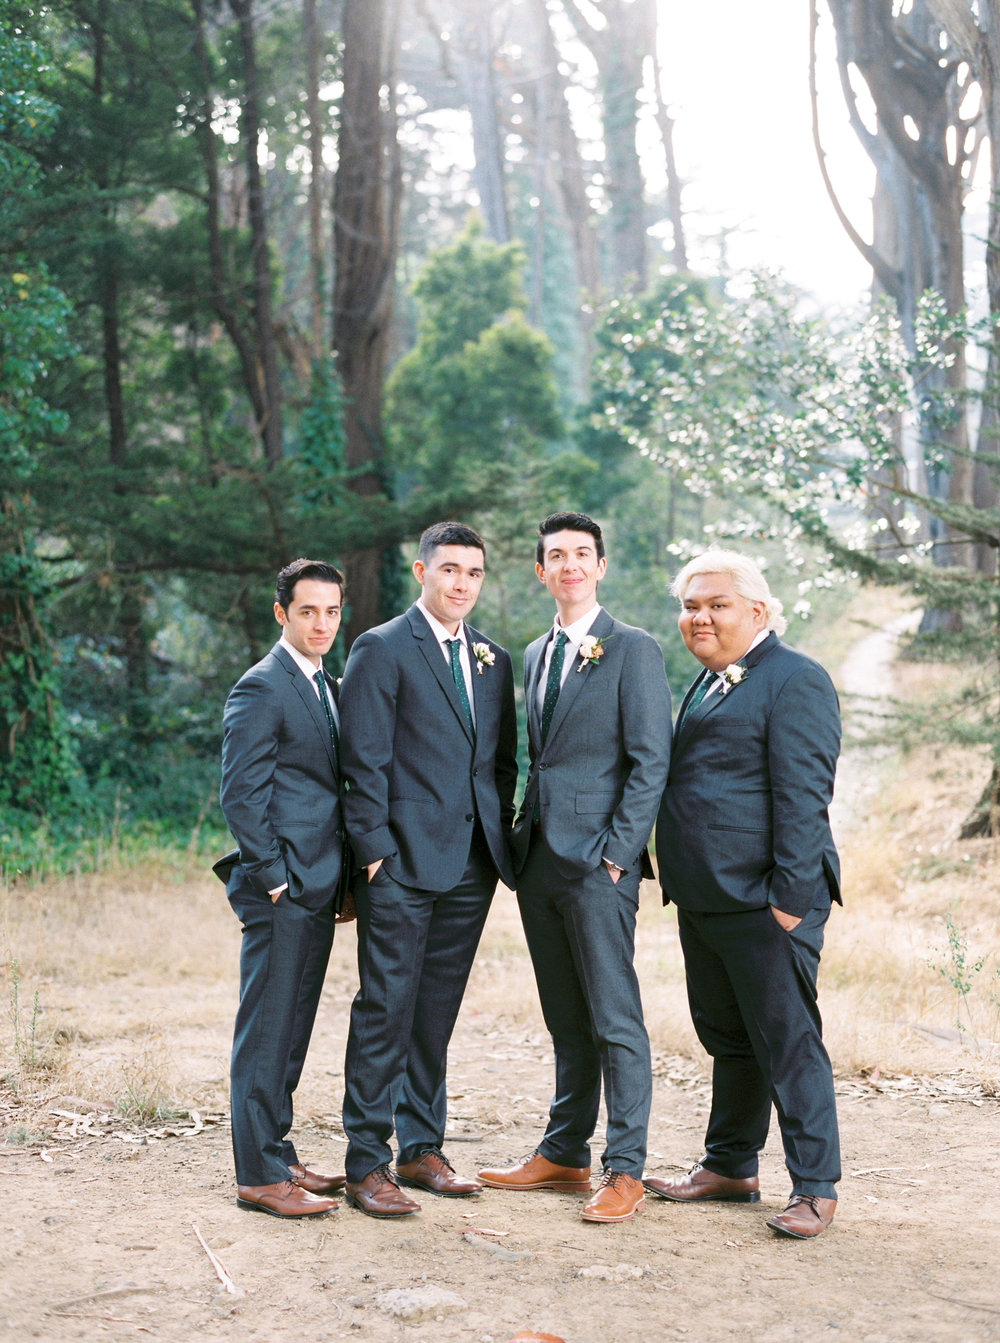 Log-cabin-wedding-in-presidio-san-francisco-california-desintation-wedding-photography-69.jpg